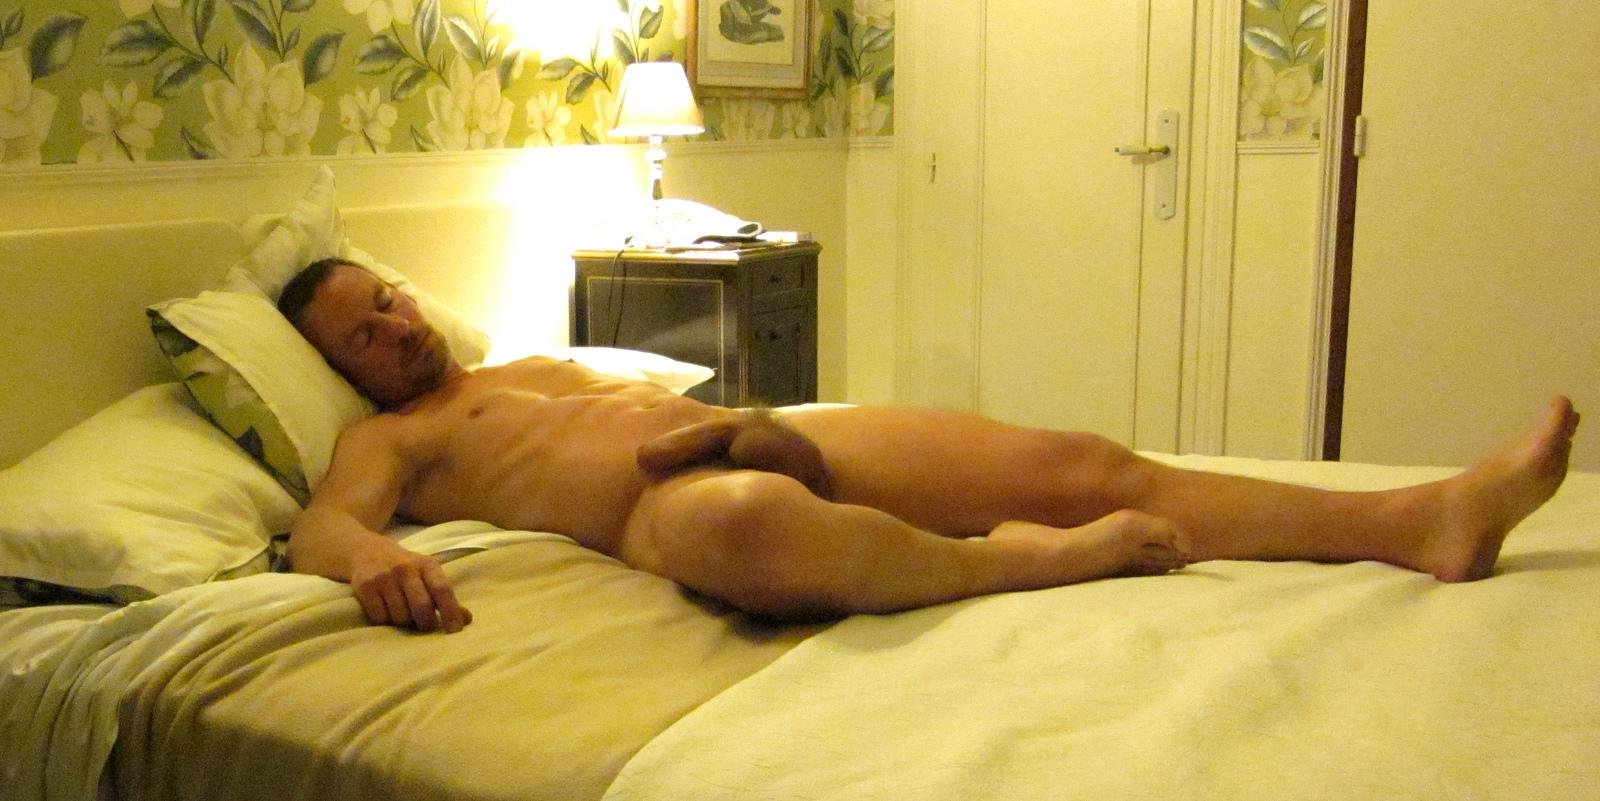 Big tittie girl sucking dick